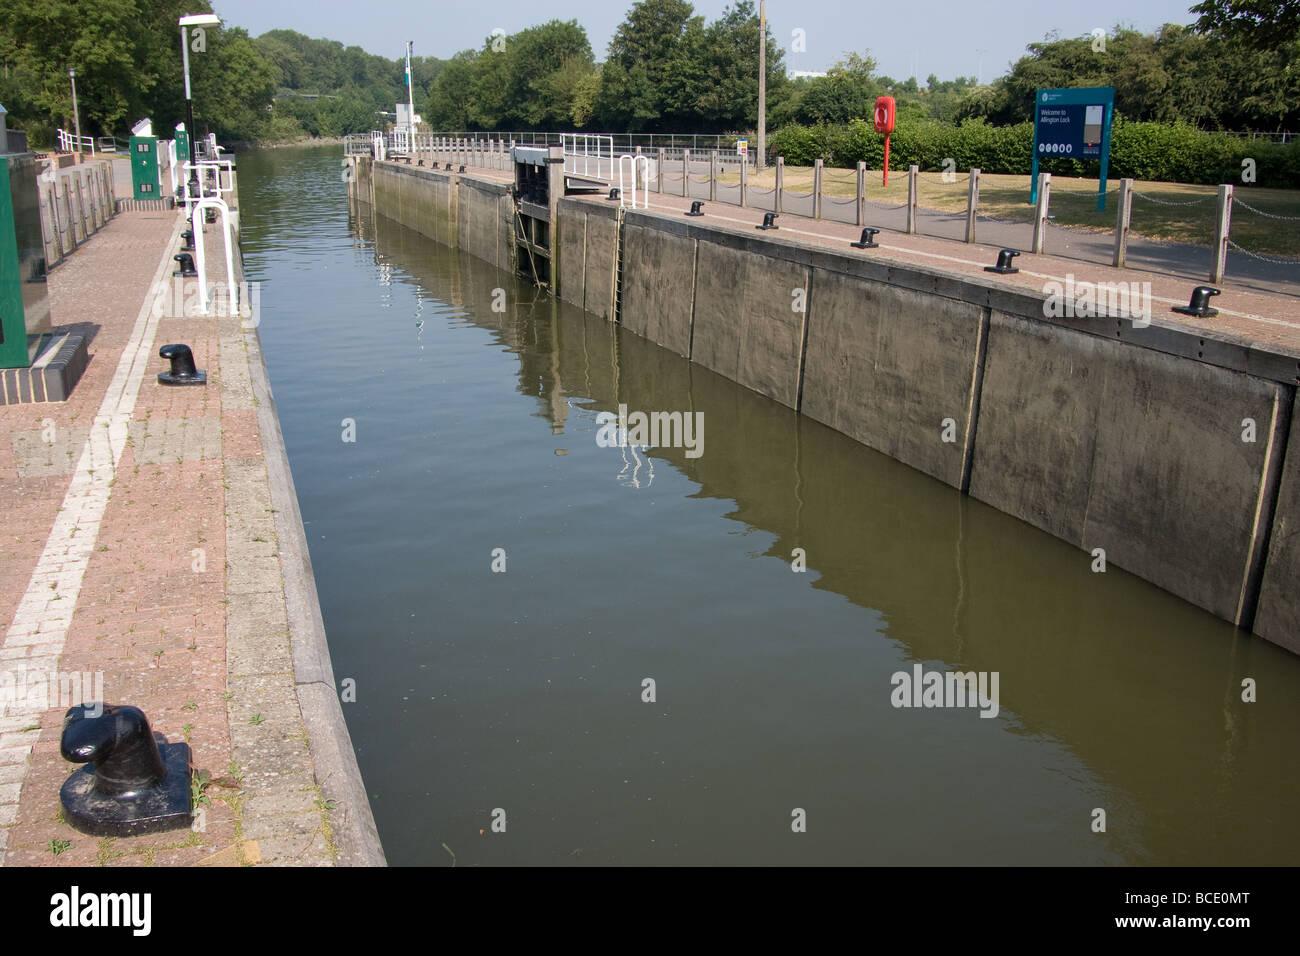 open lock chamber modernised placid river wall  Allington Lock River Medway Maidstone Kent England UK eUROPE - Stock Image